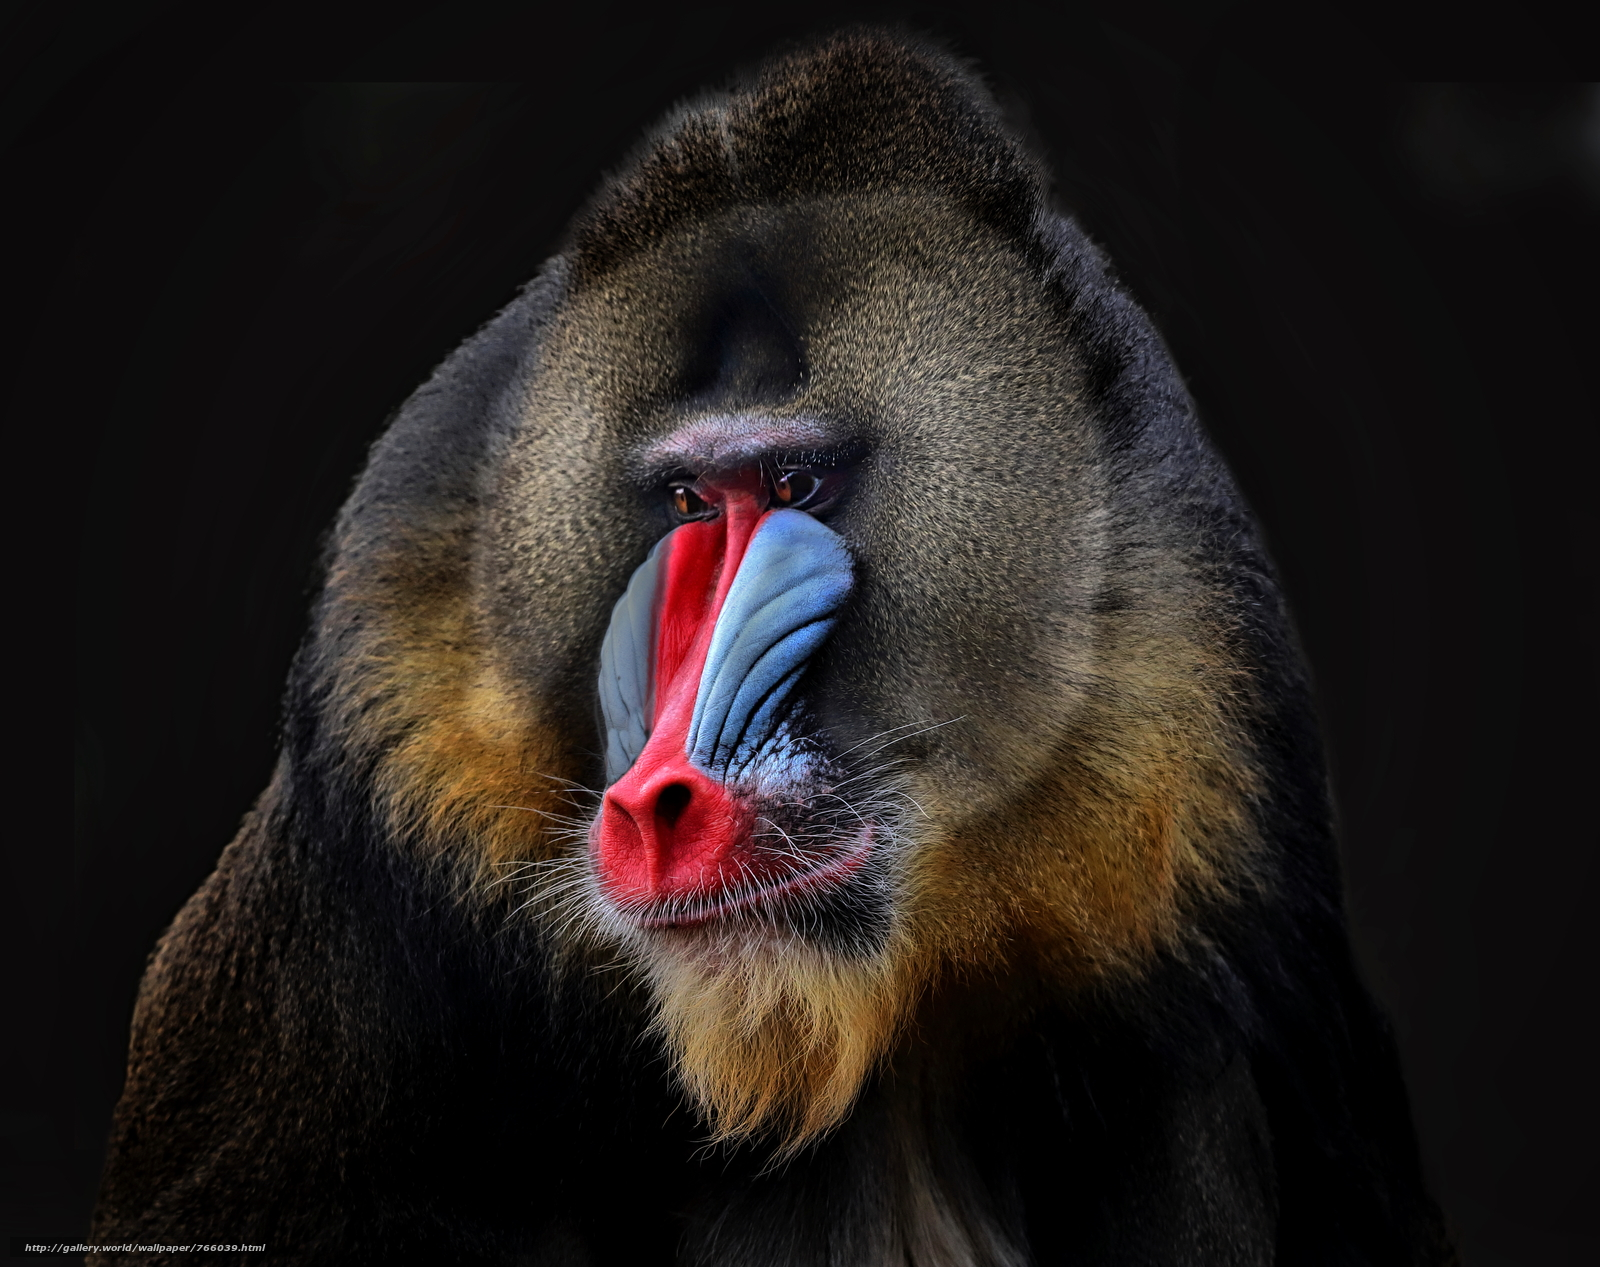 Baboon, baboon, baboon, a monkey, Photo portrait